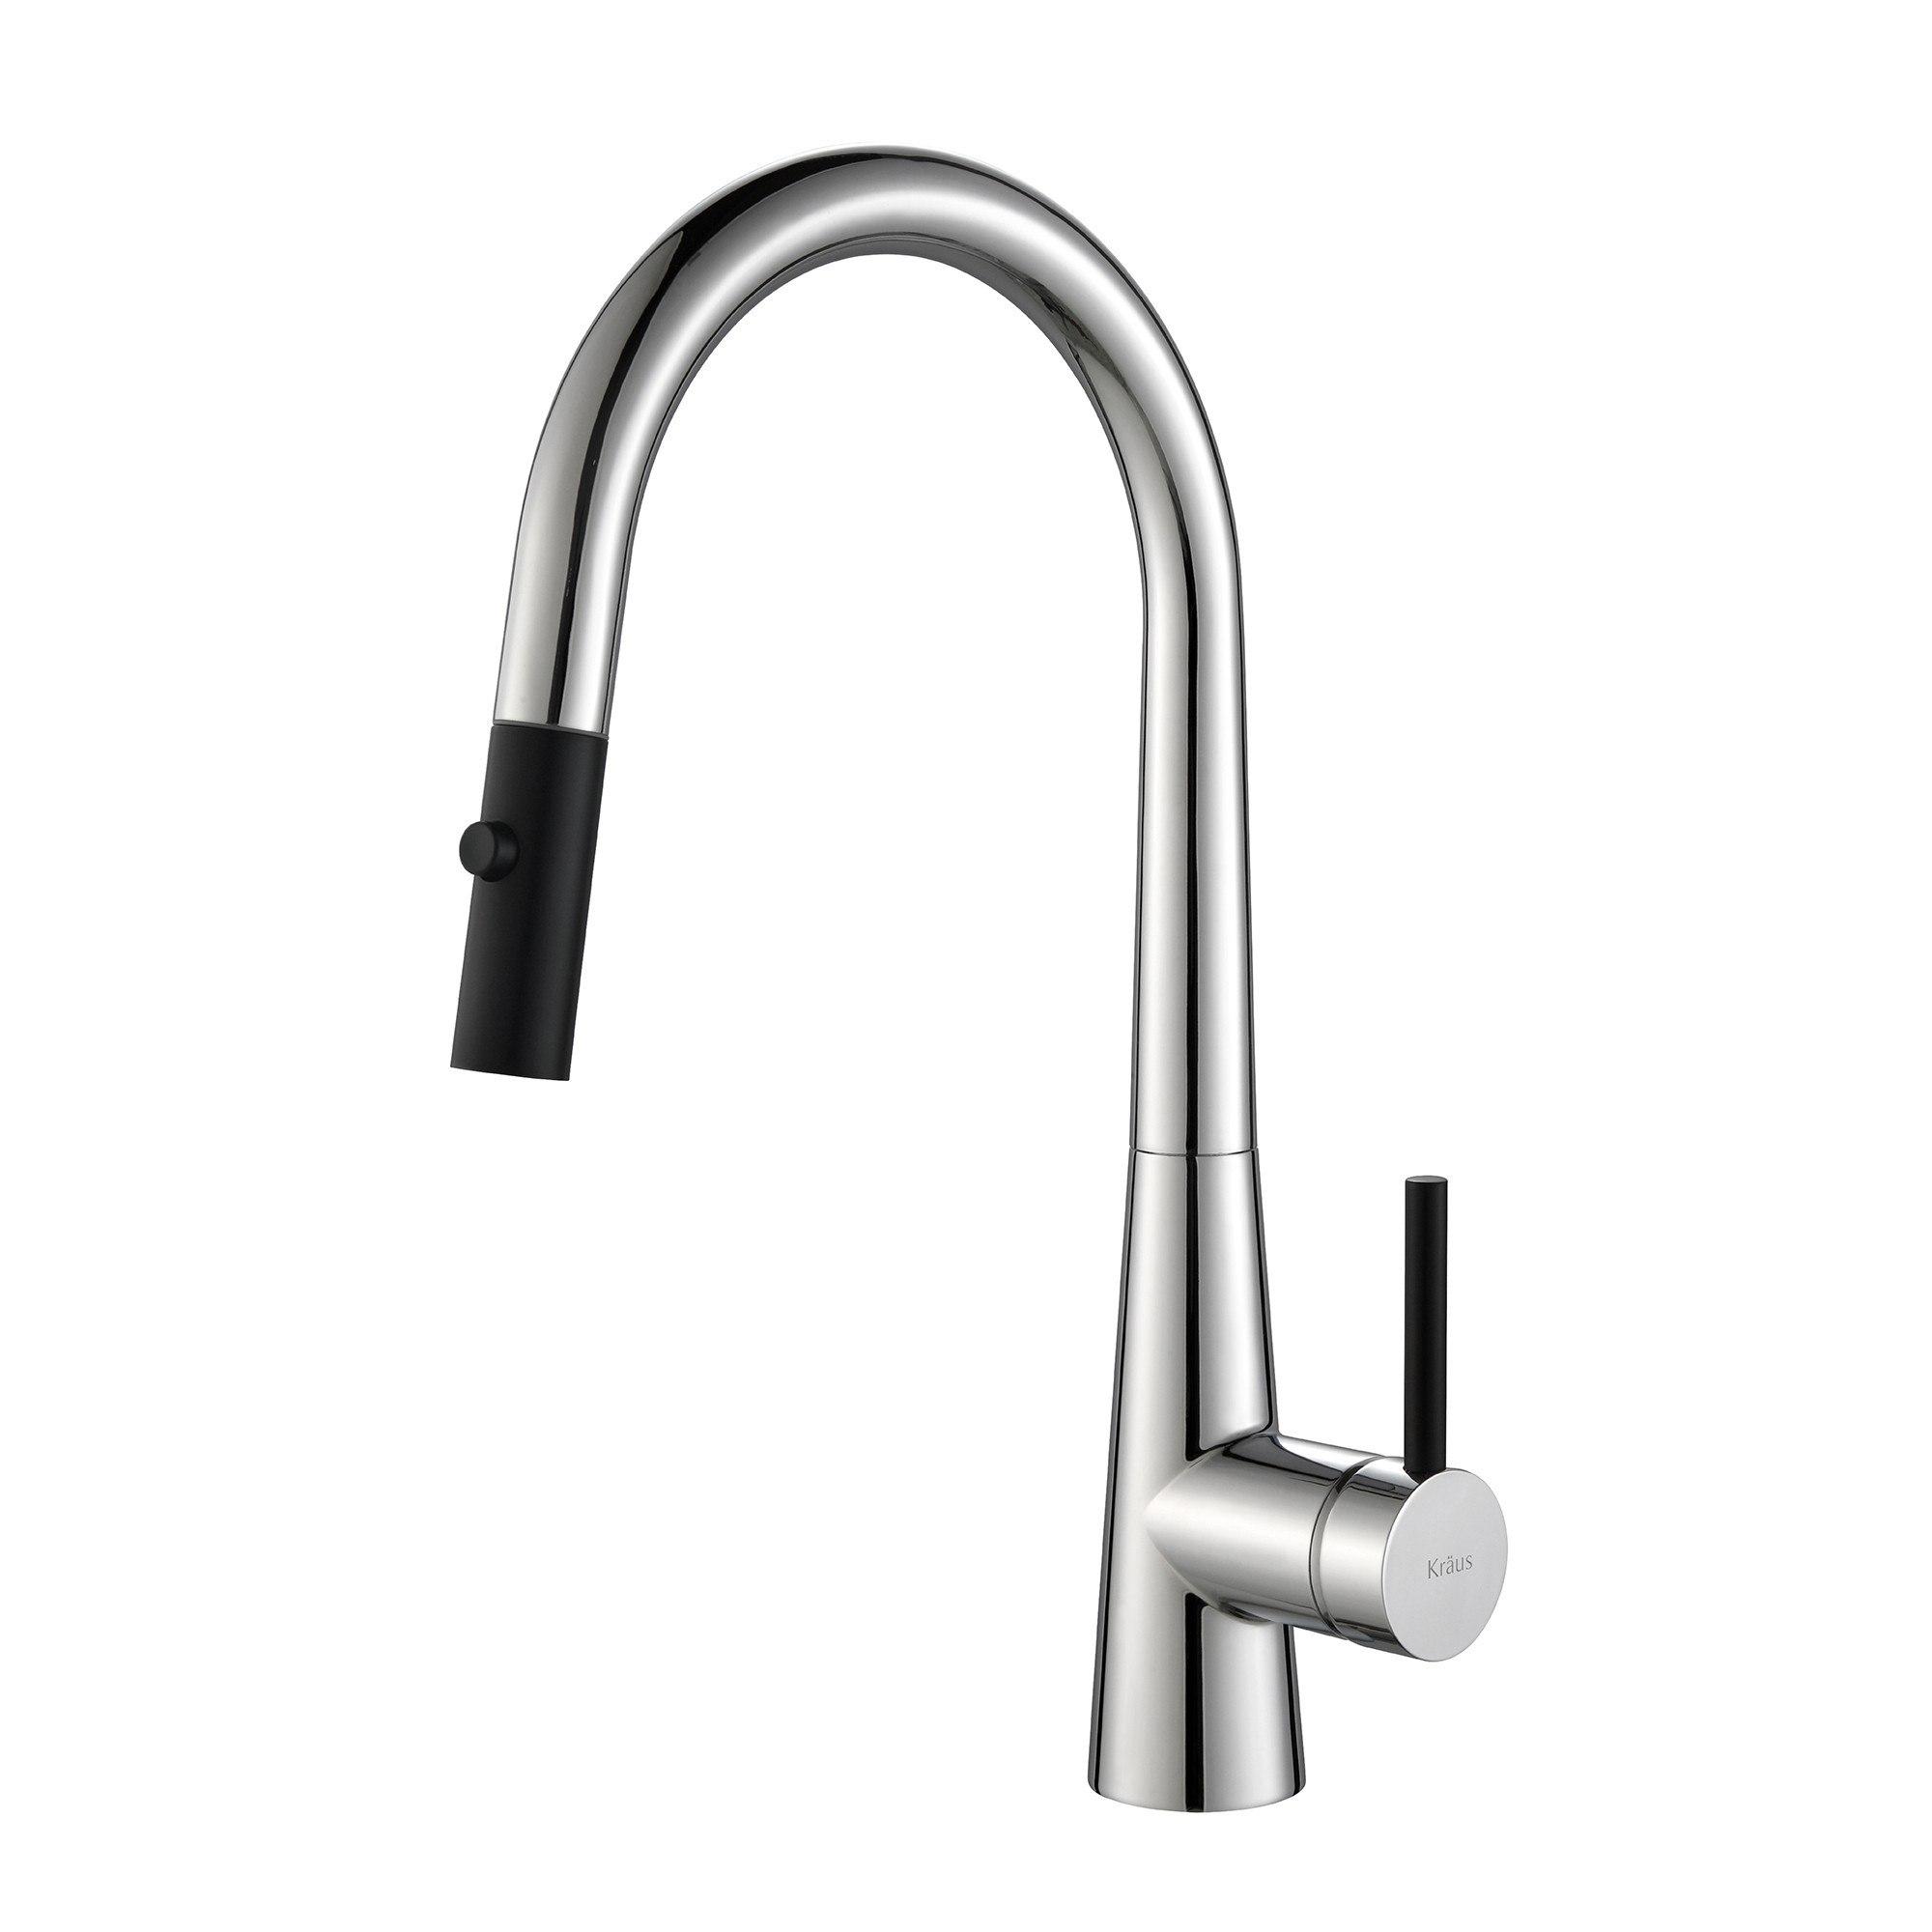 Kraus Kpf 2720 Crespo Single Lever Pull Down Kitchen Faucet Kpf 2720ch Kpf2720ch Kpf 2720ss